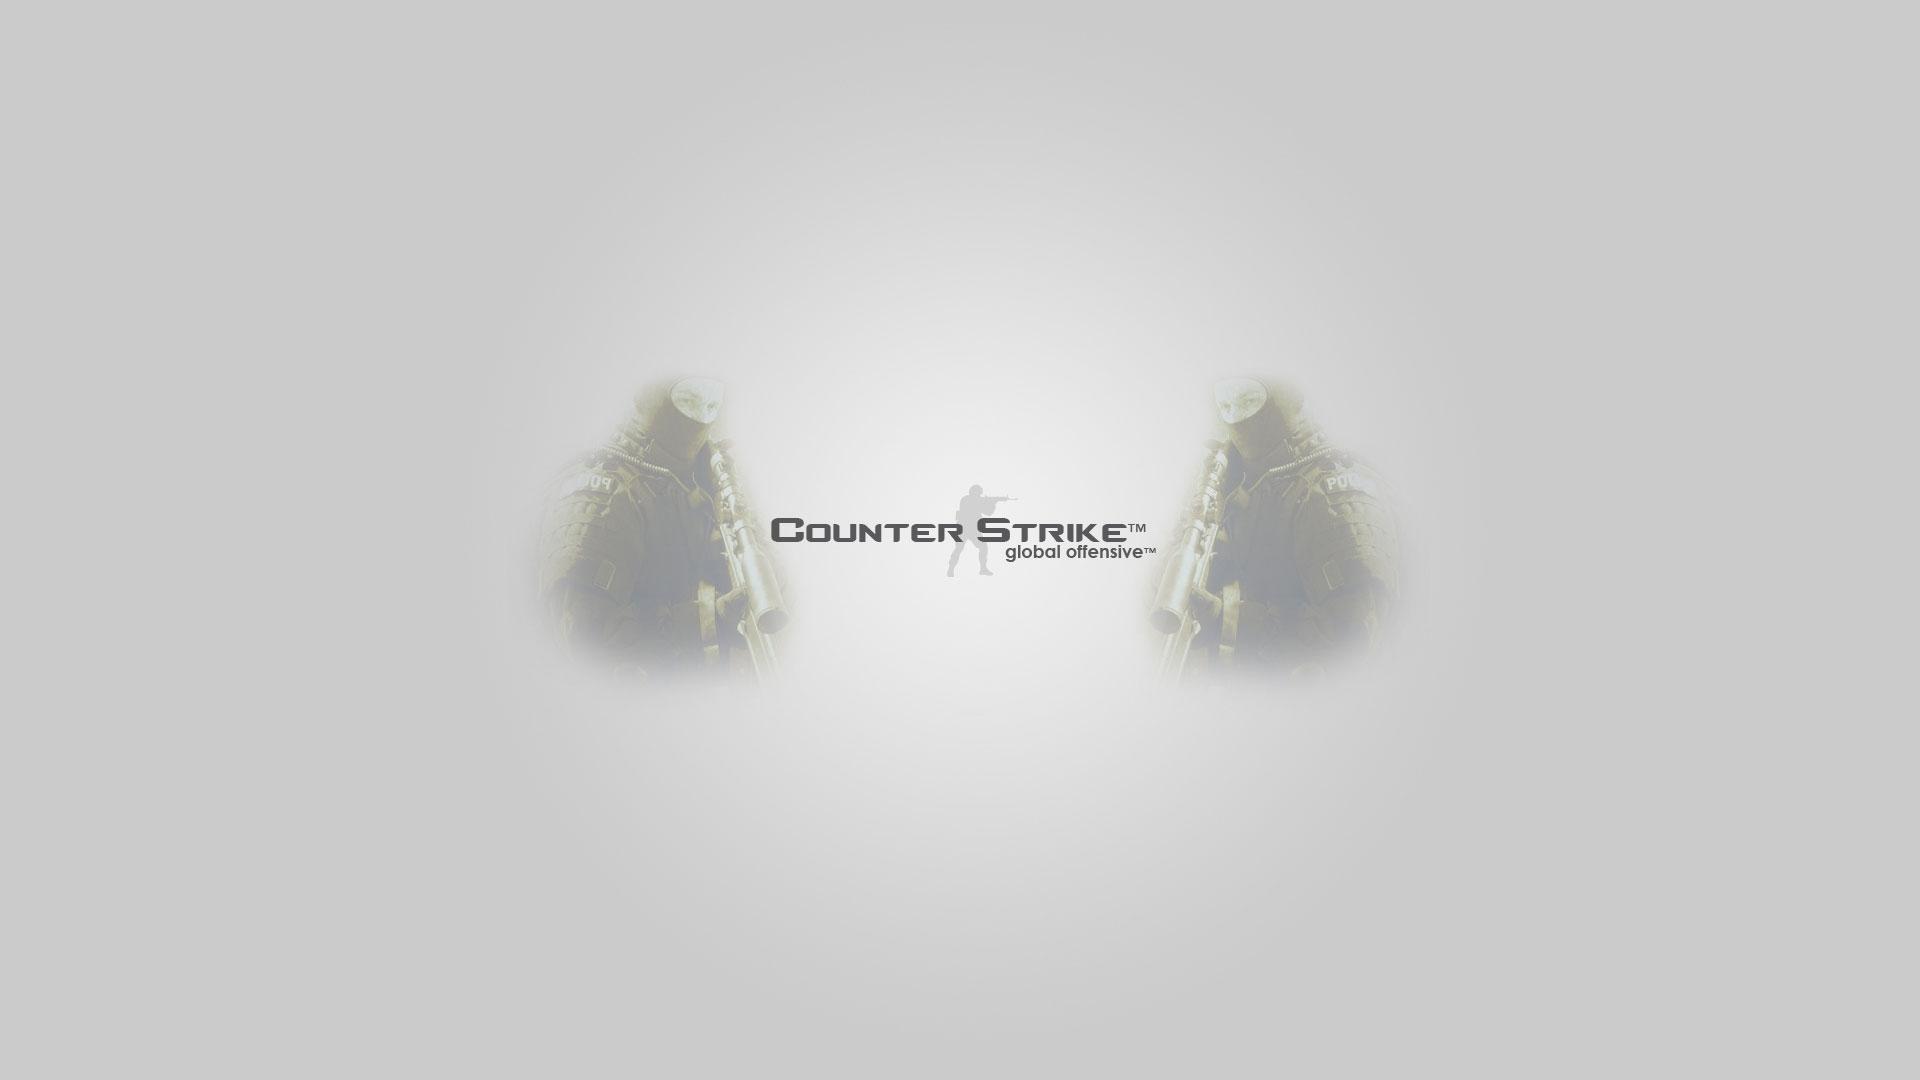 CSGO   Counter Strike Global Offensive Wallpaper Hintergrundbild 1920x1080